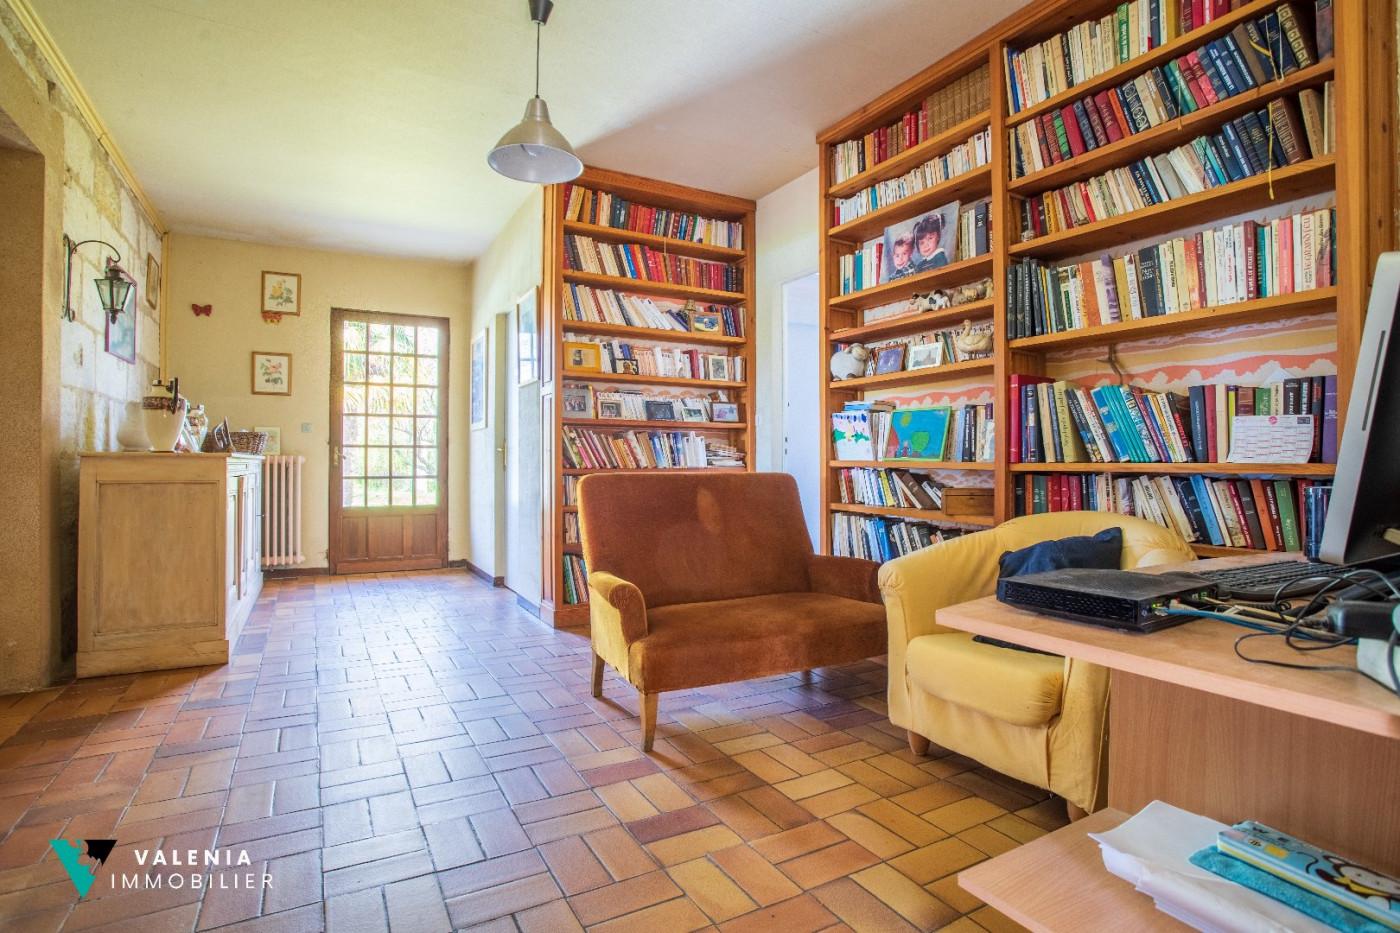 A vendre  Libourne | Réf 3453411529 - Valenia immobilier